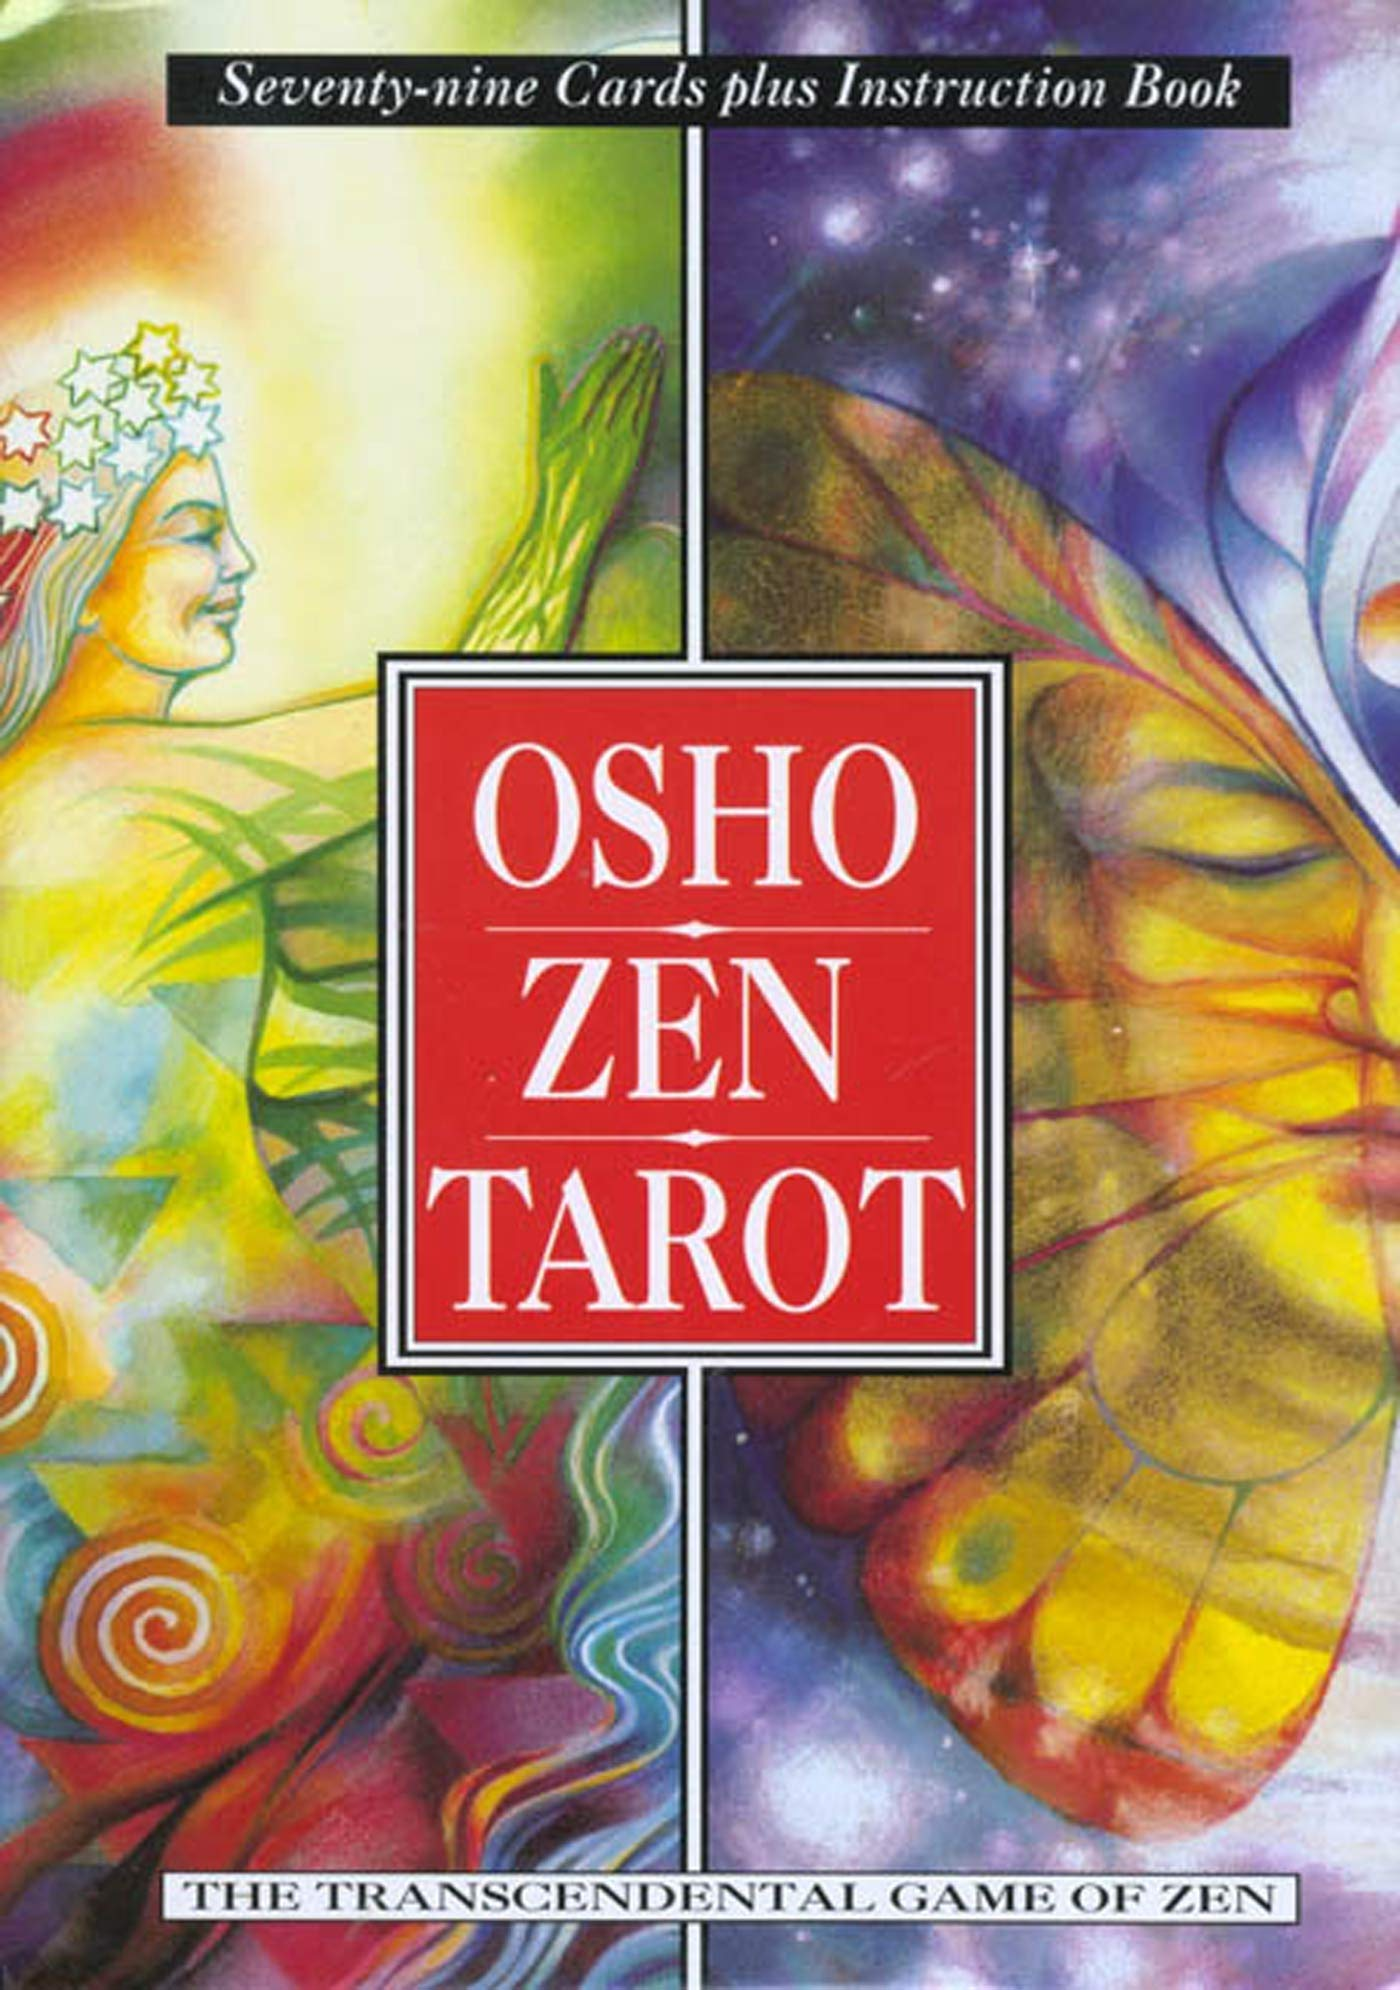 e7fa69bcb88257 Amazon.com  Osho Zen Tarot  The Transcendental Game Of Zen (79-Card ...